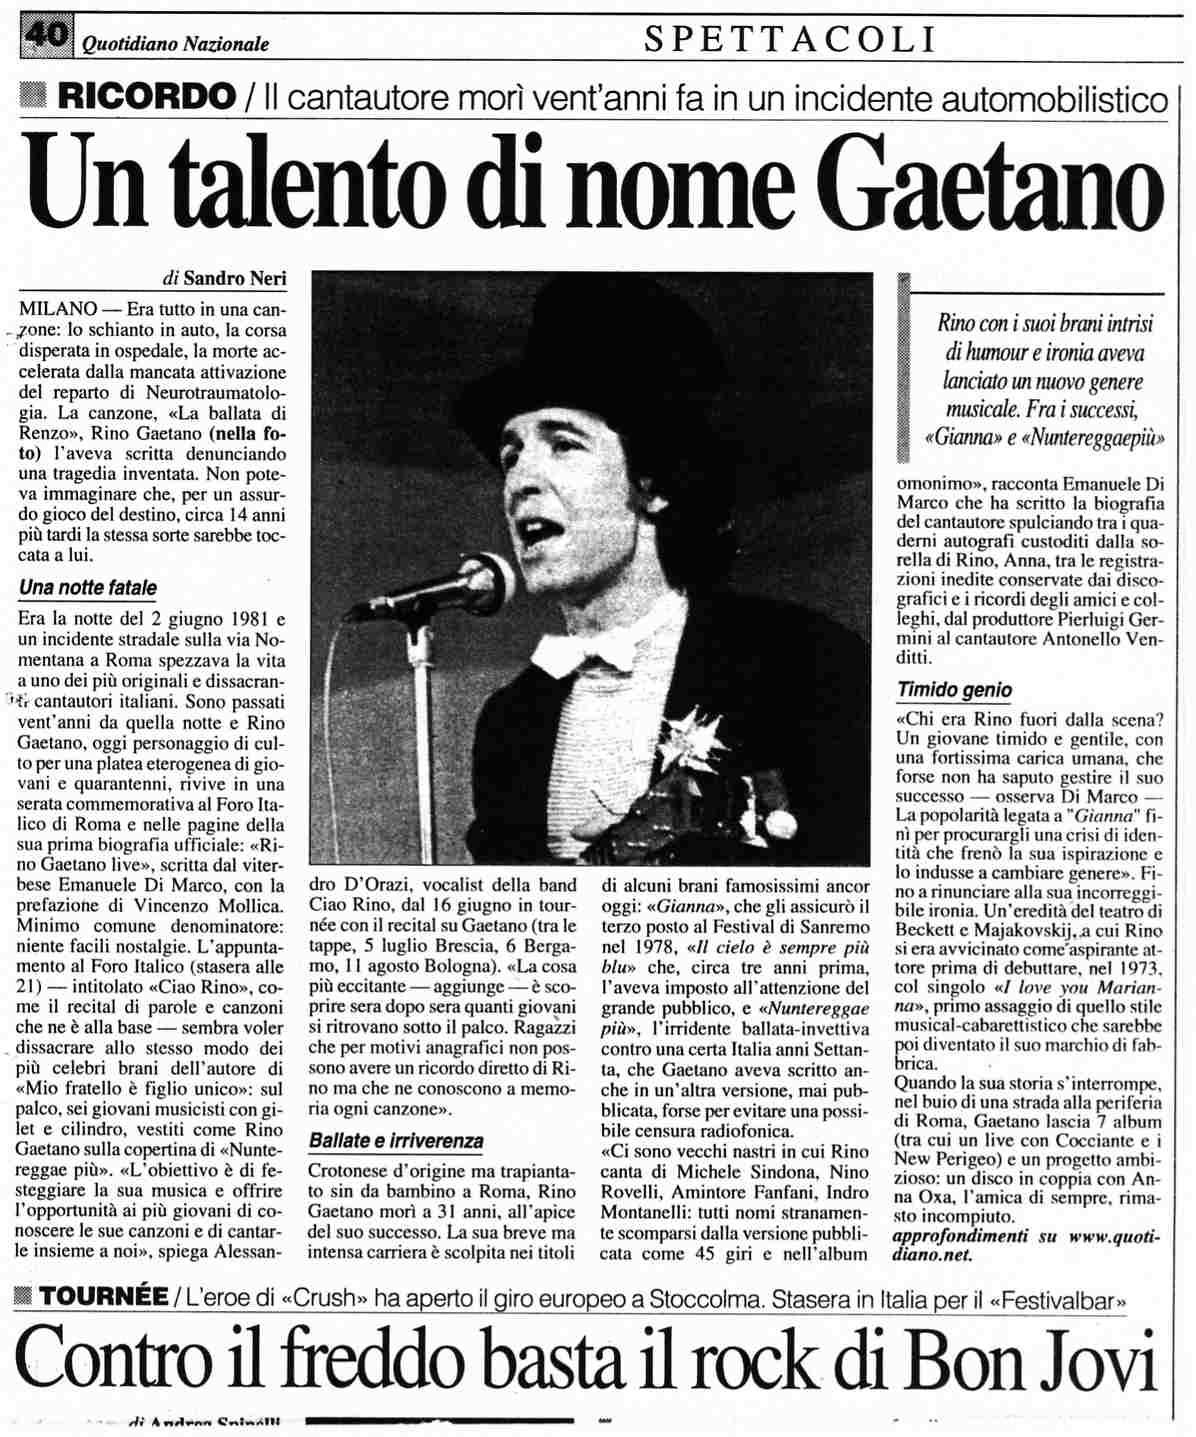 Rino Gaetano - La Discografia